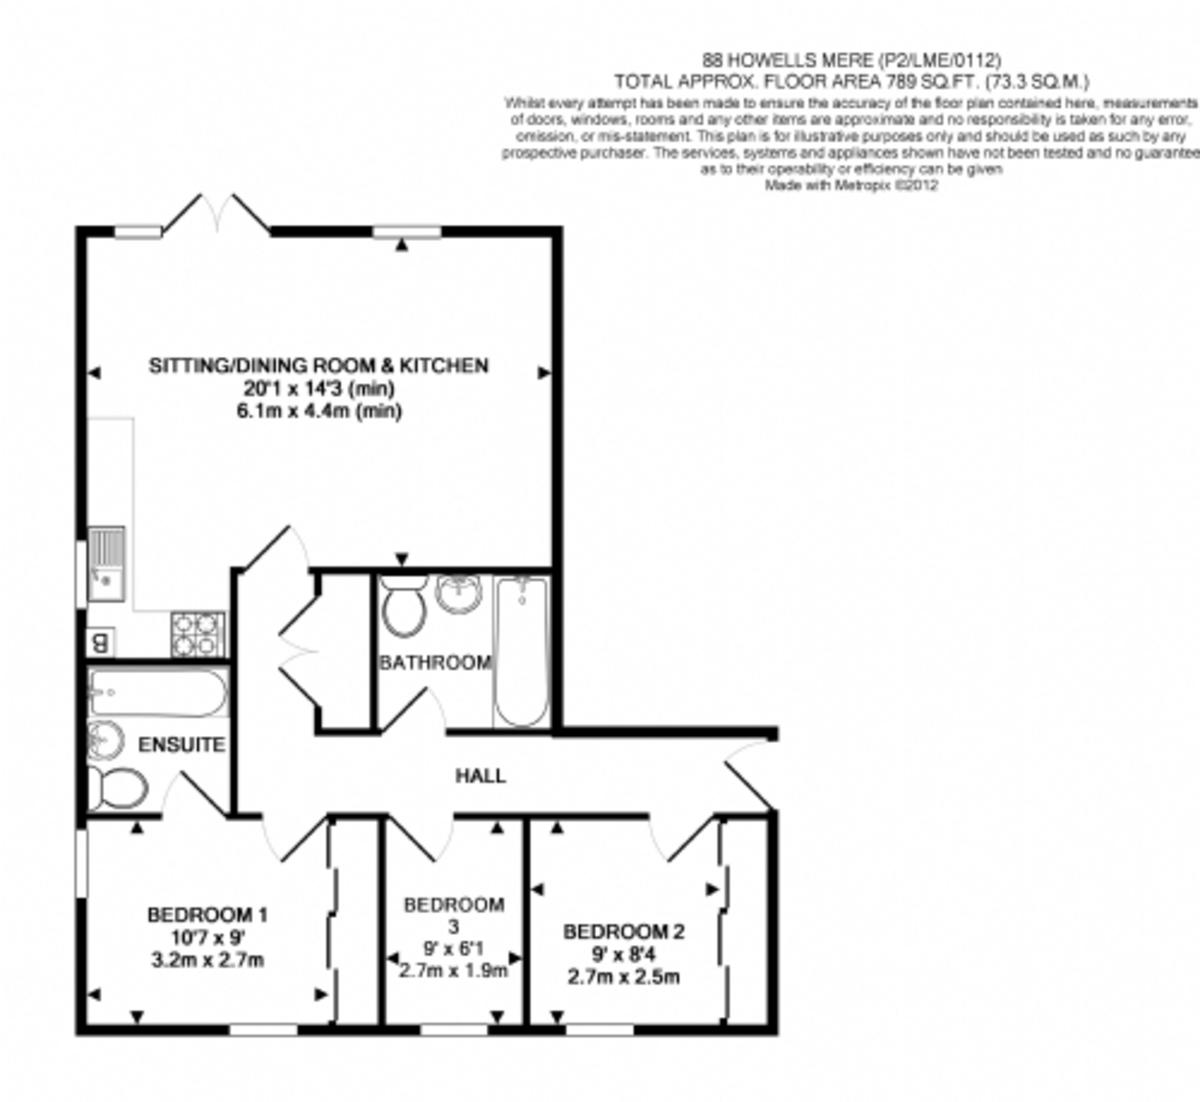 The Lower Mill Estate, Cotswolds floorplan